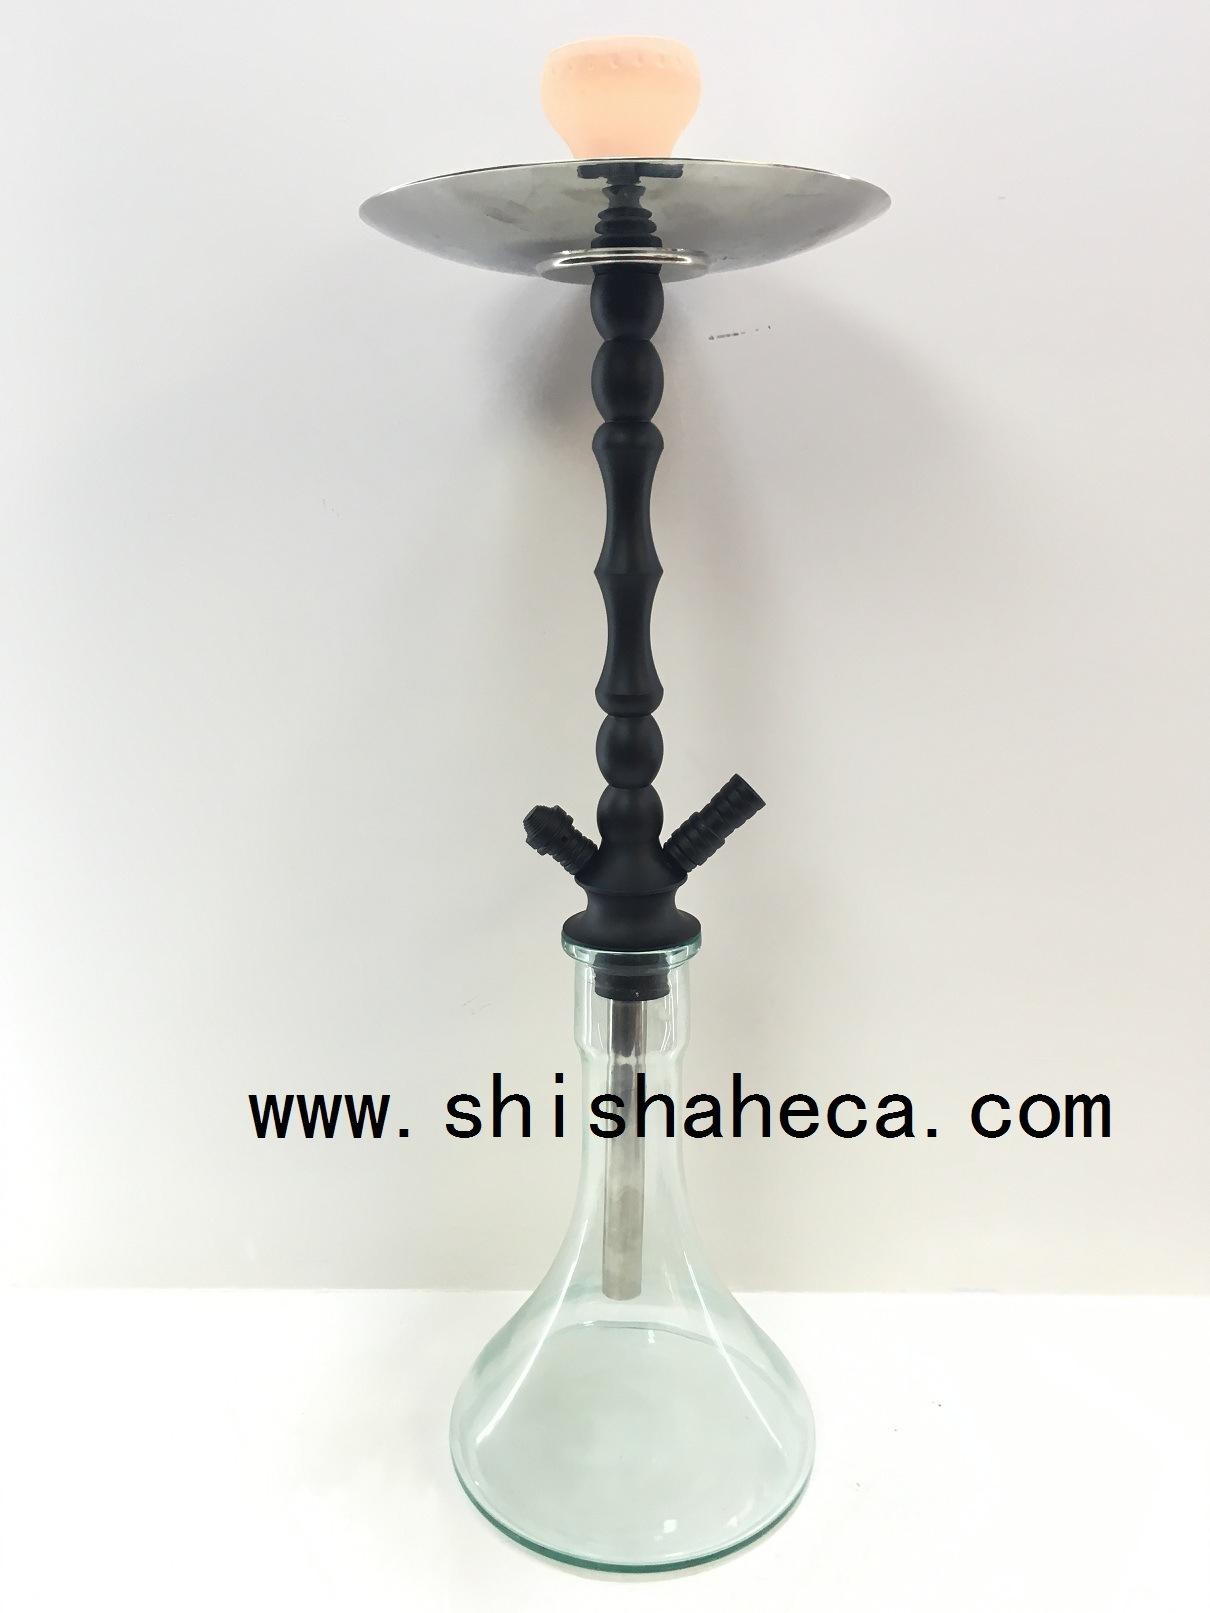 Wholesale Good Quality Aluminium Shisha Nargile Smoking Pipe Hookah